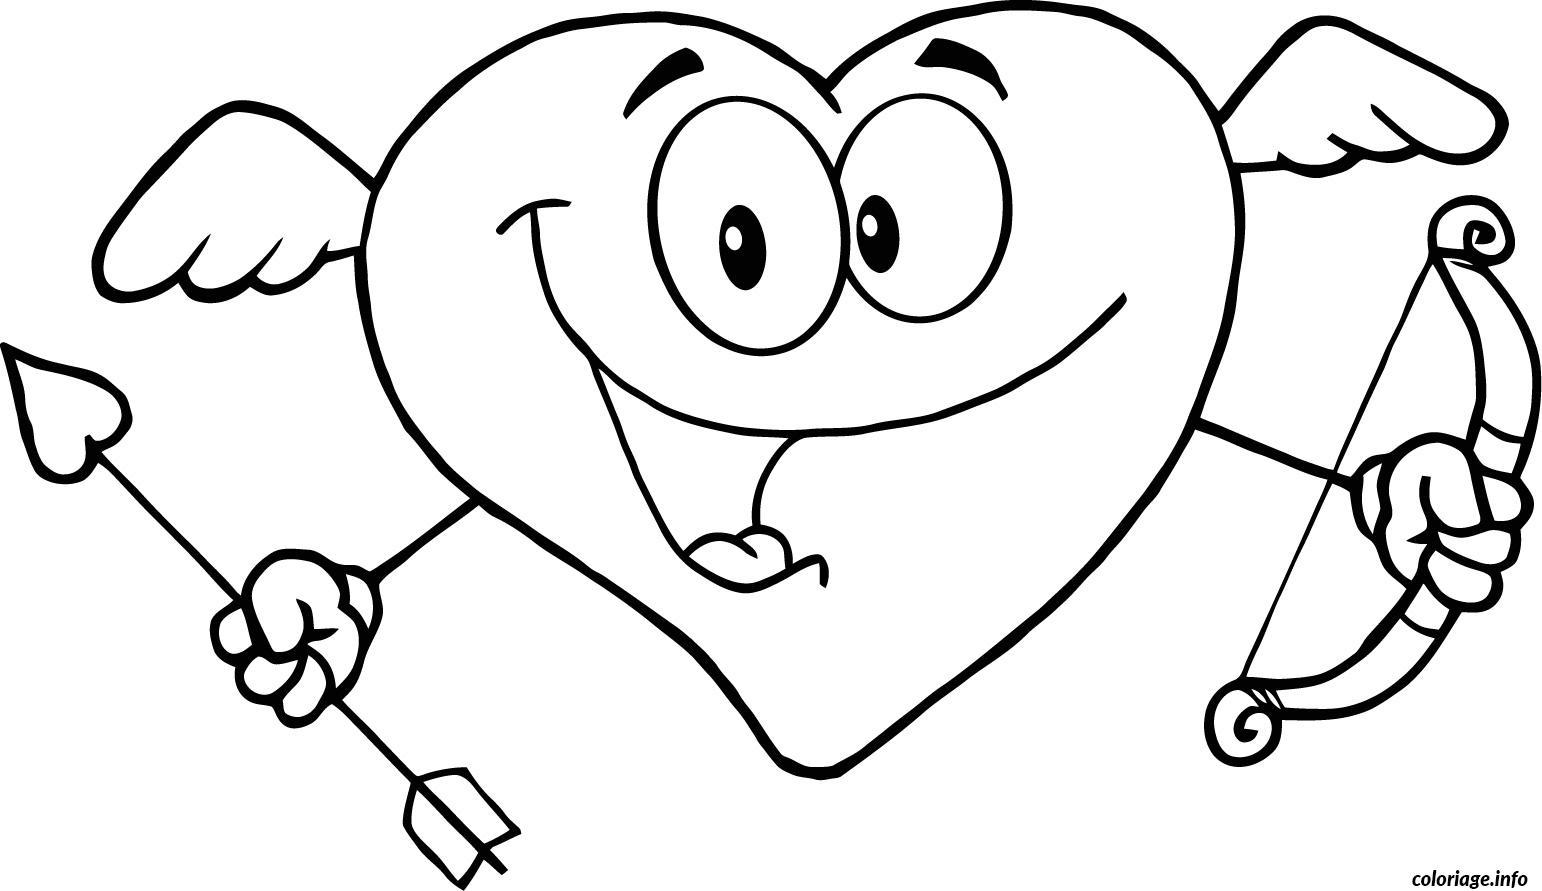 Coloriage dessin amour 47 dessin - Image dessin amour ...